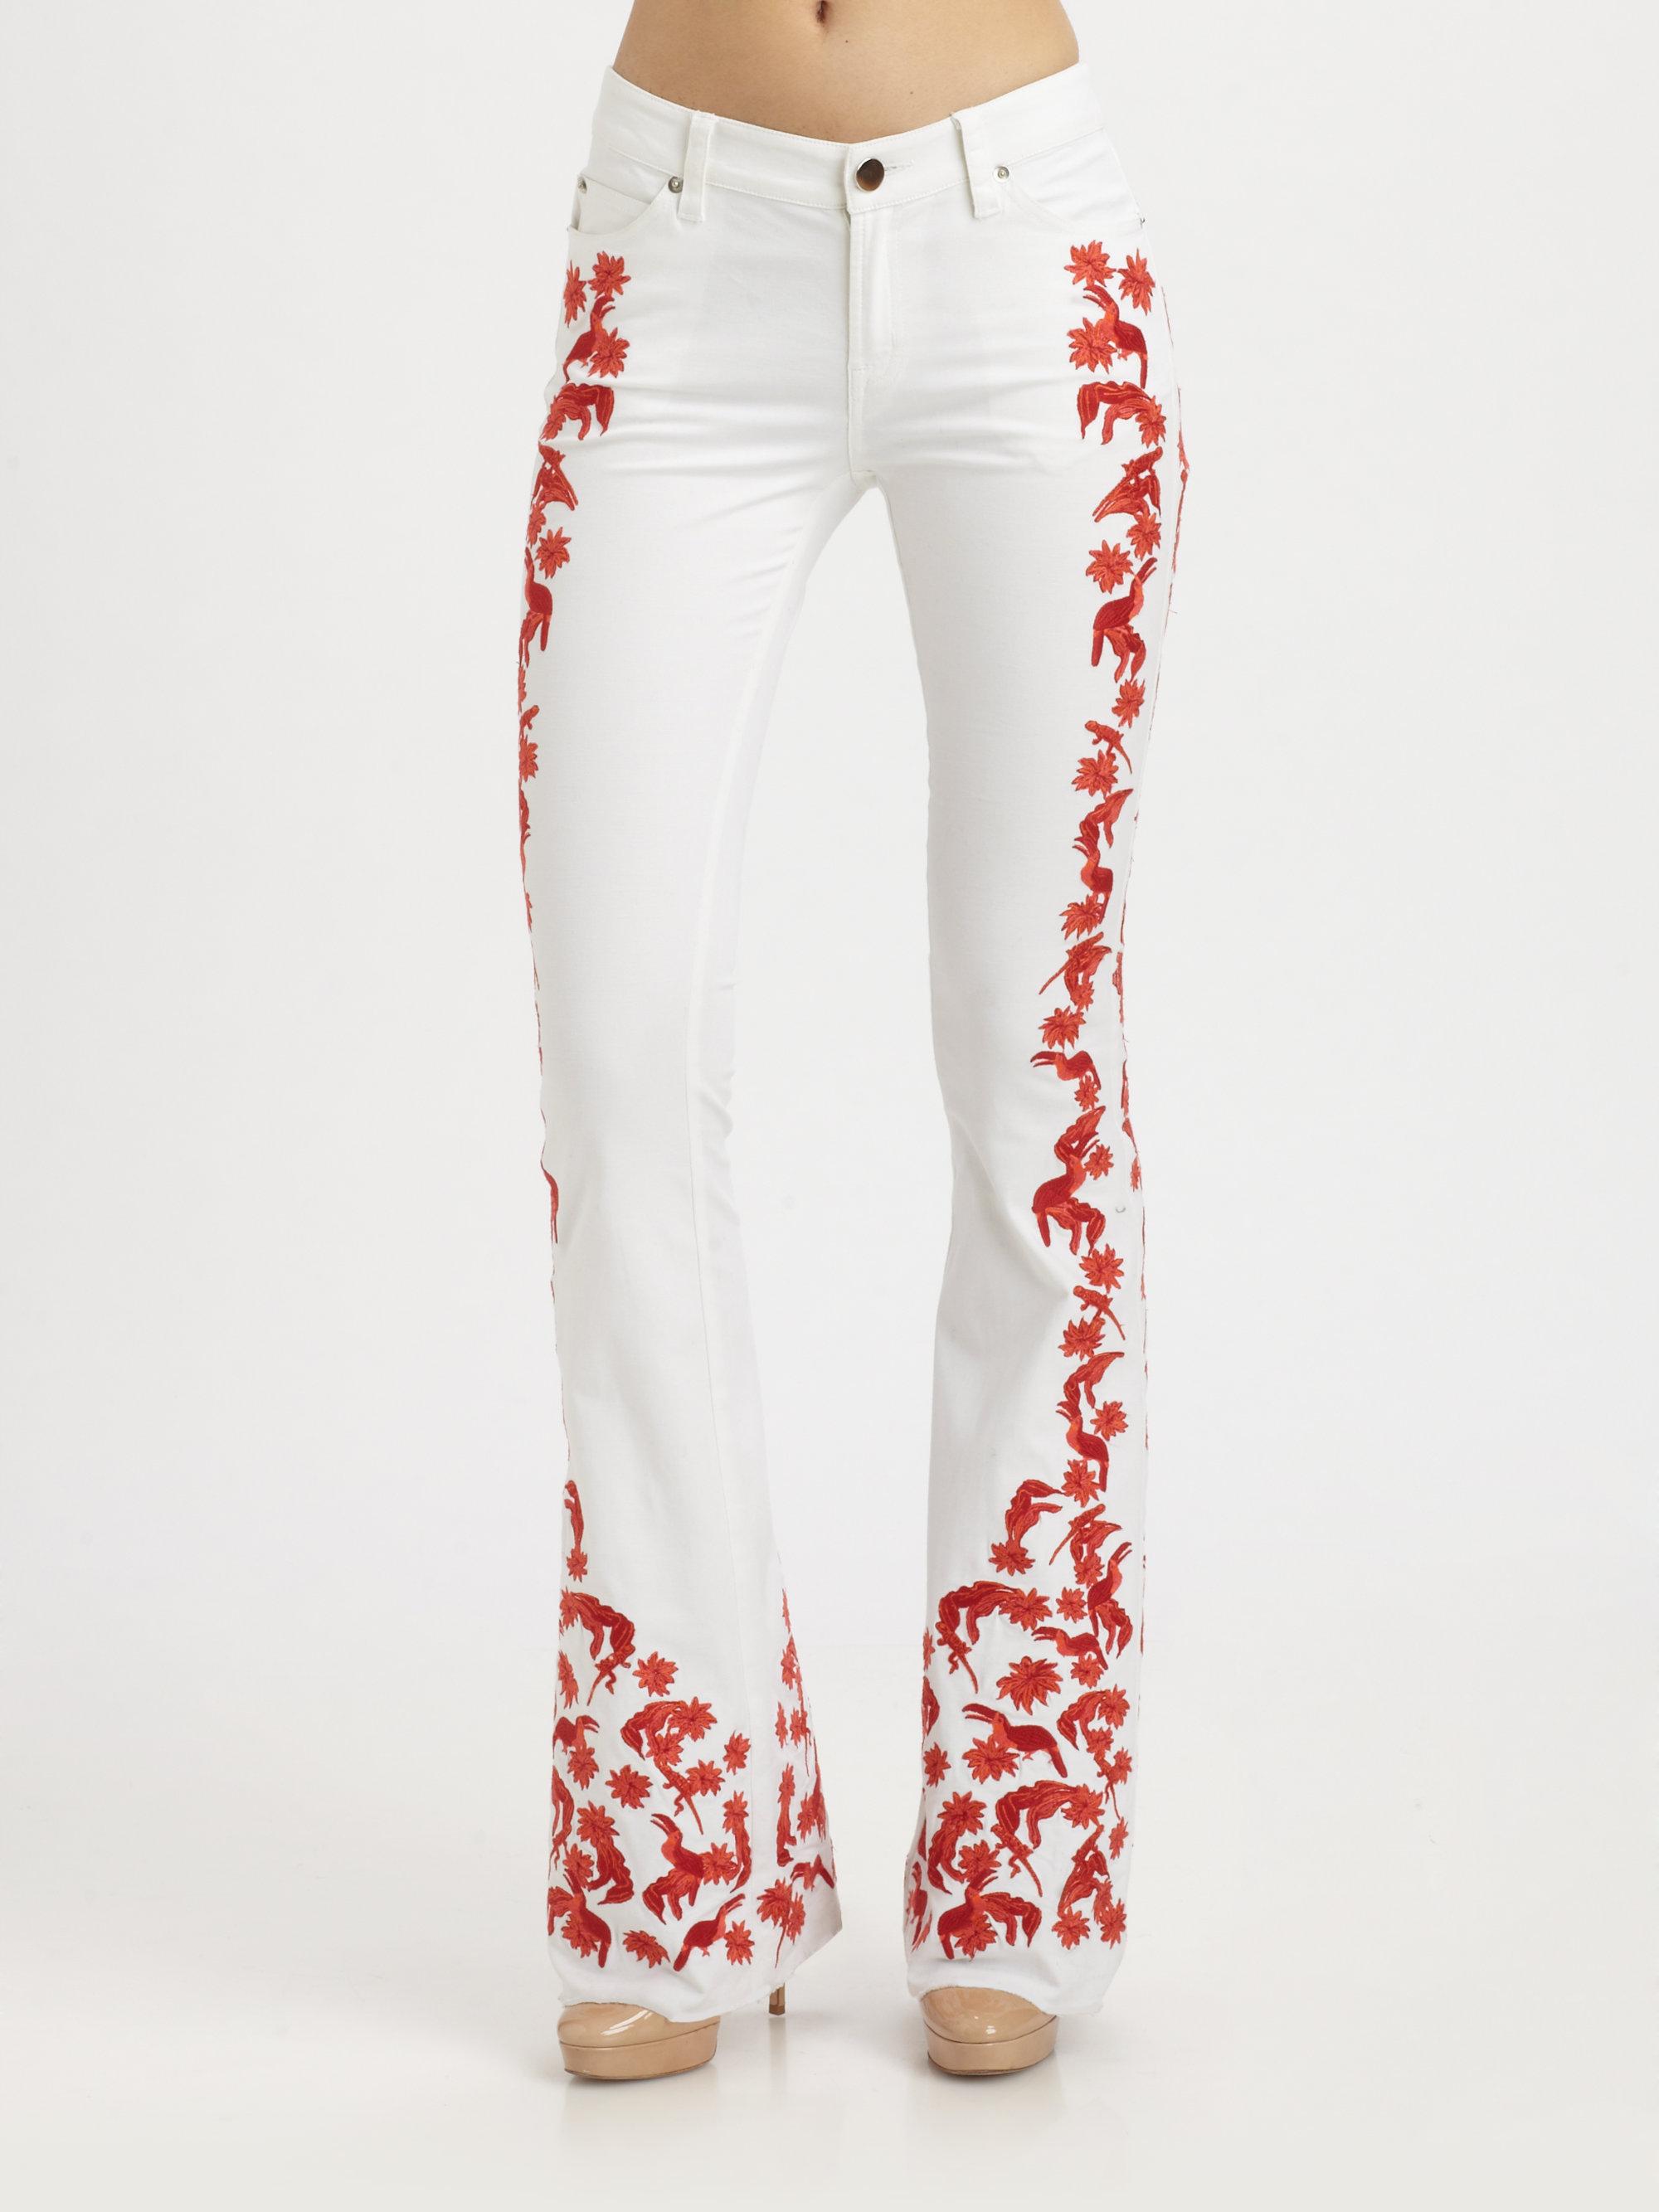 DENIM - Denim trousers Rebecca Minkoff Outlet Finishline Cheap 2018 Newest Best Place Sale Online LB2Xx